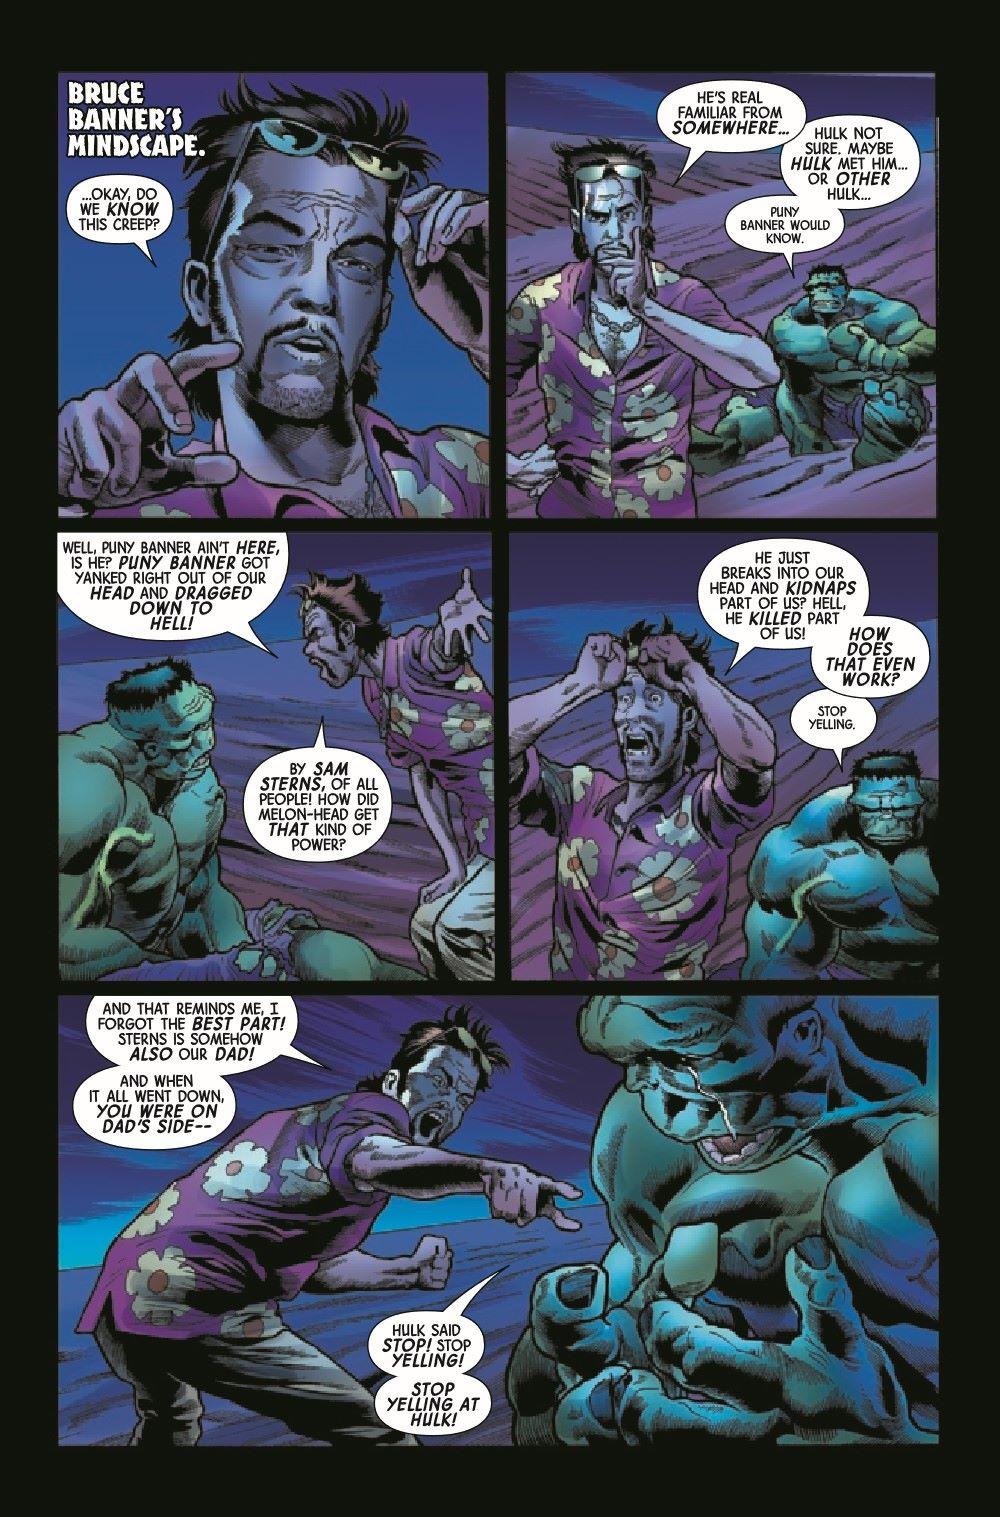 HULK2018040_Preview-4 ComicList Previews: IMMORTAL HULK #40